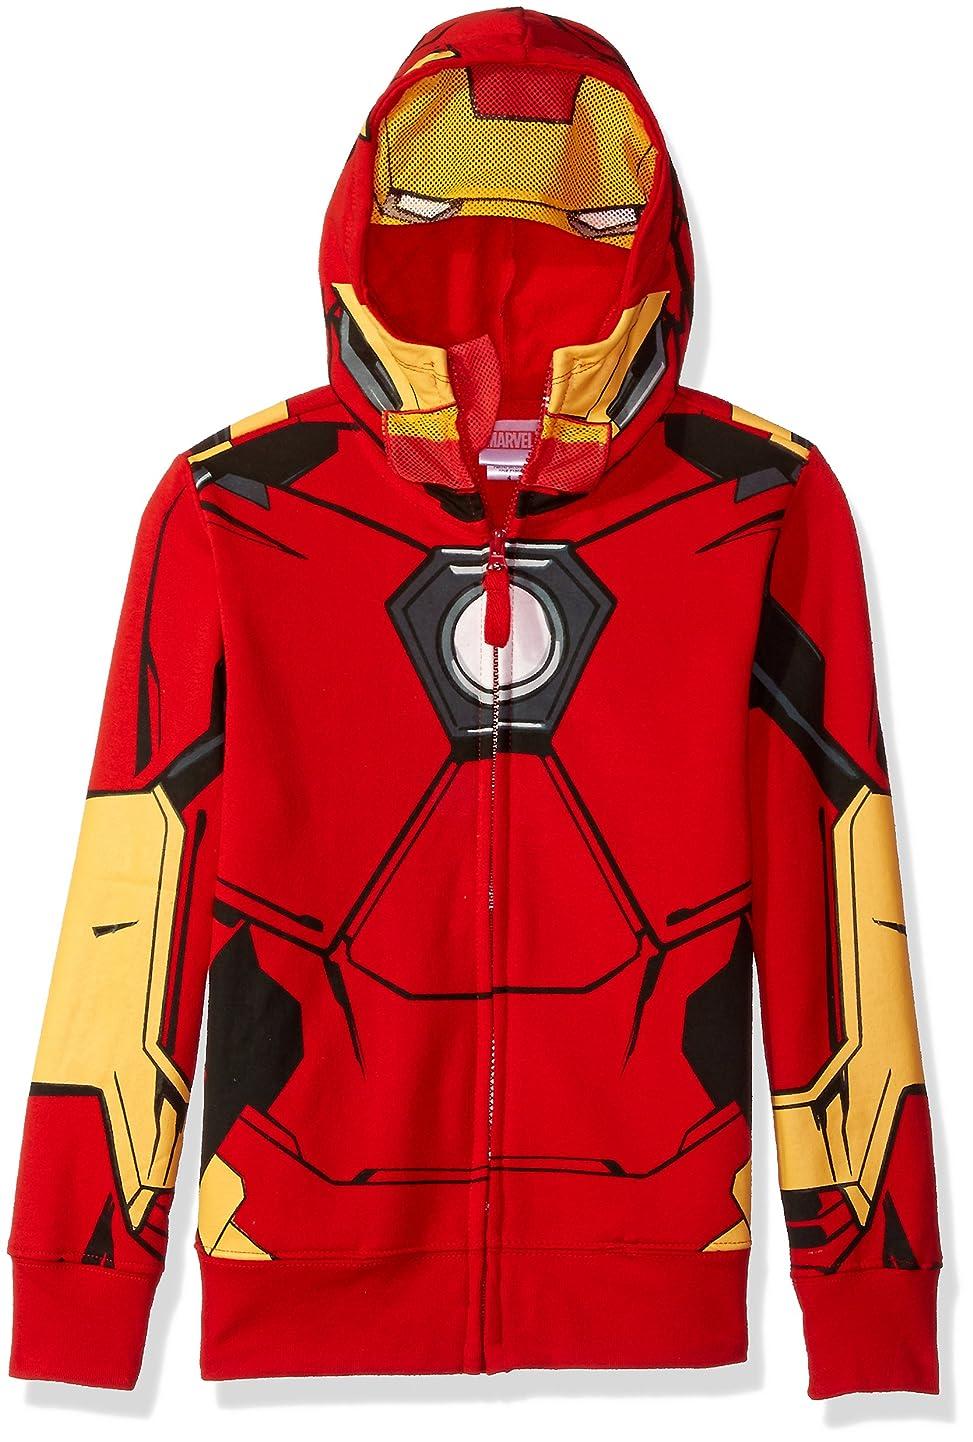 Marvel Boys' Iron Man Costume Zip-up Hoodie fbqiiiwtgui0